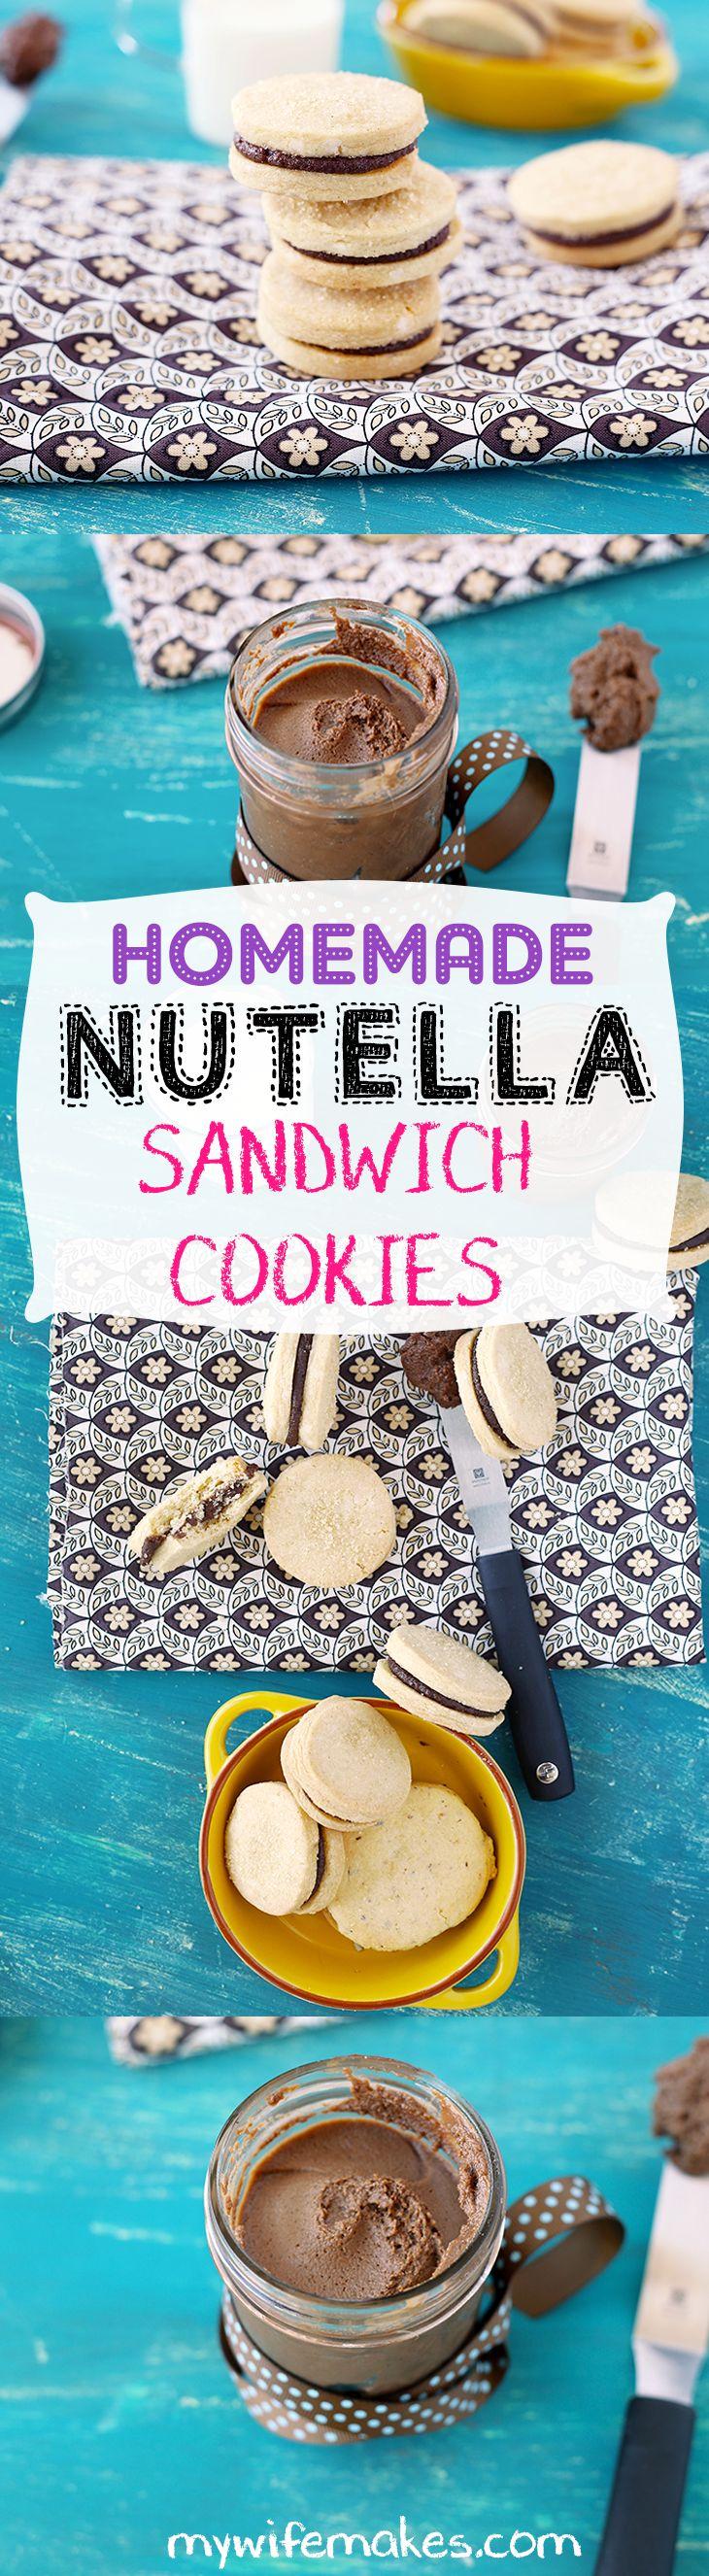 Homemade vegan Nutella sandwich cookies.